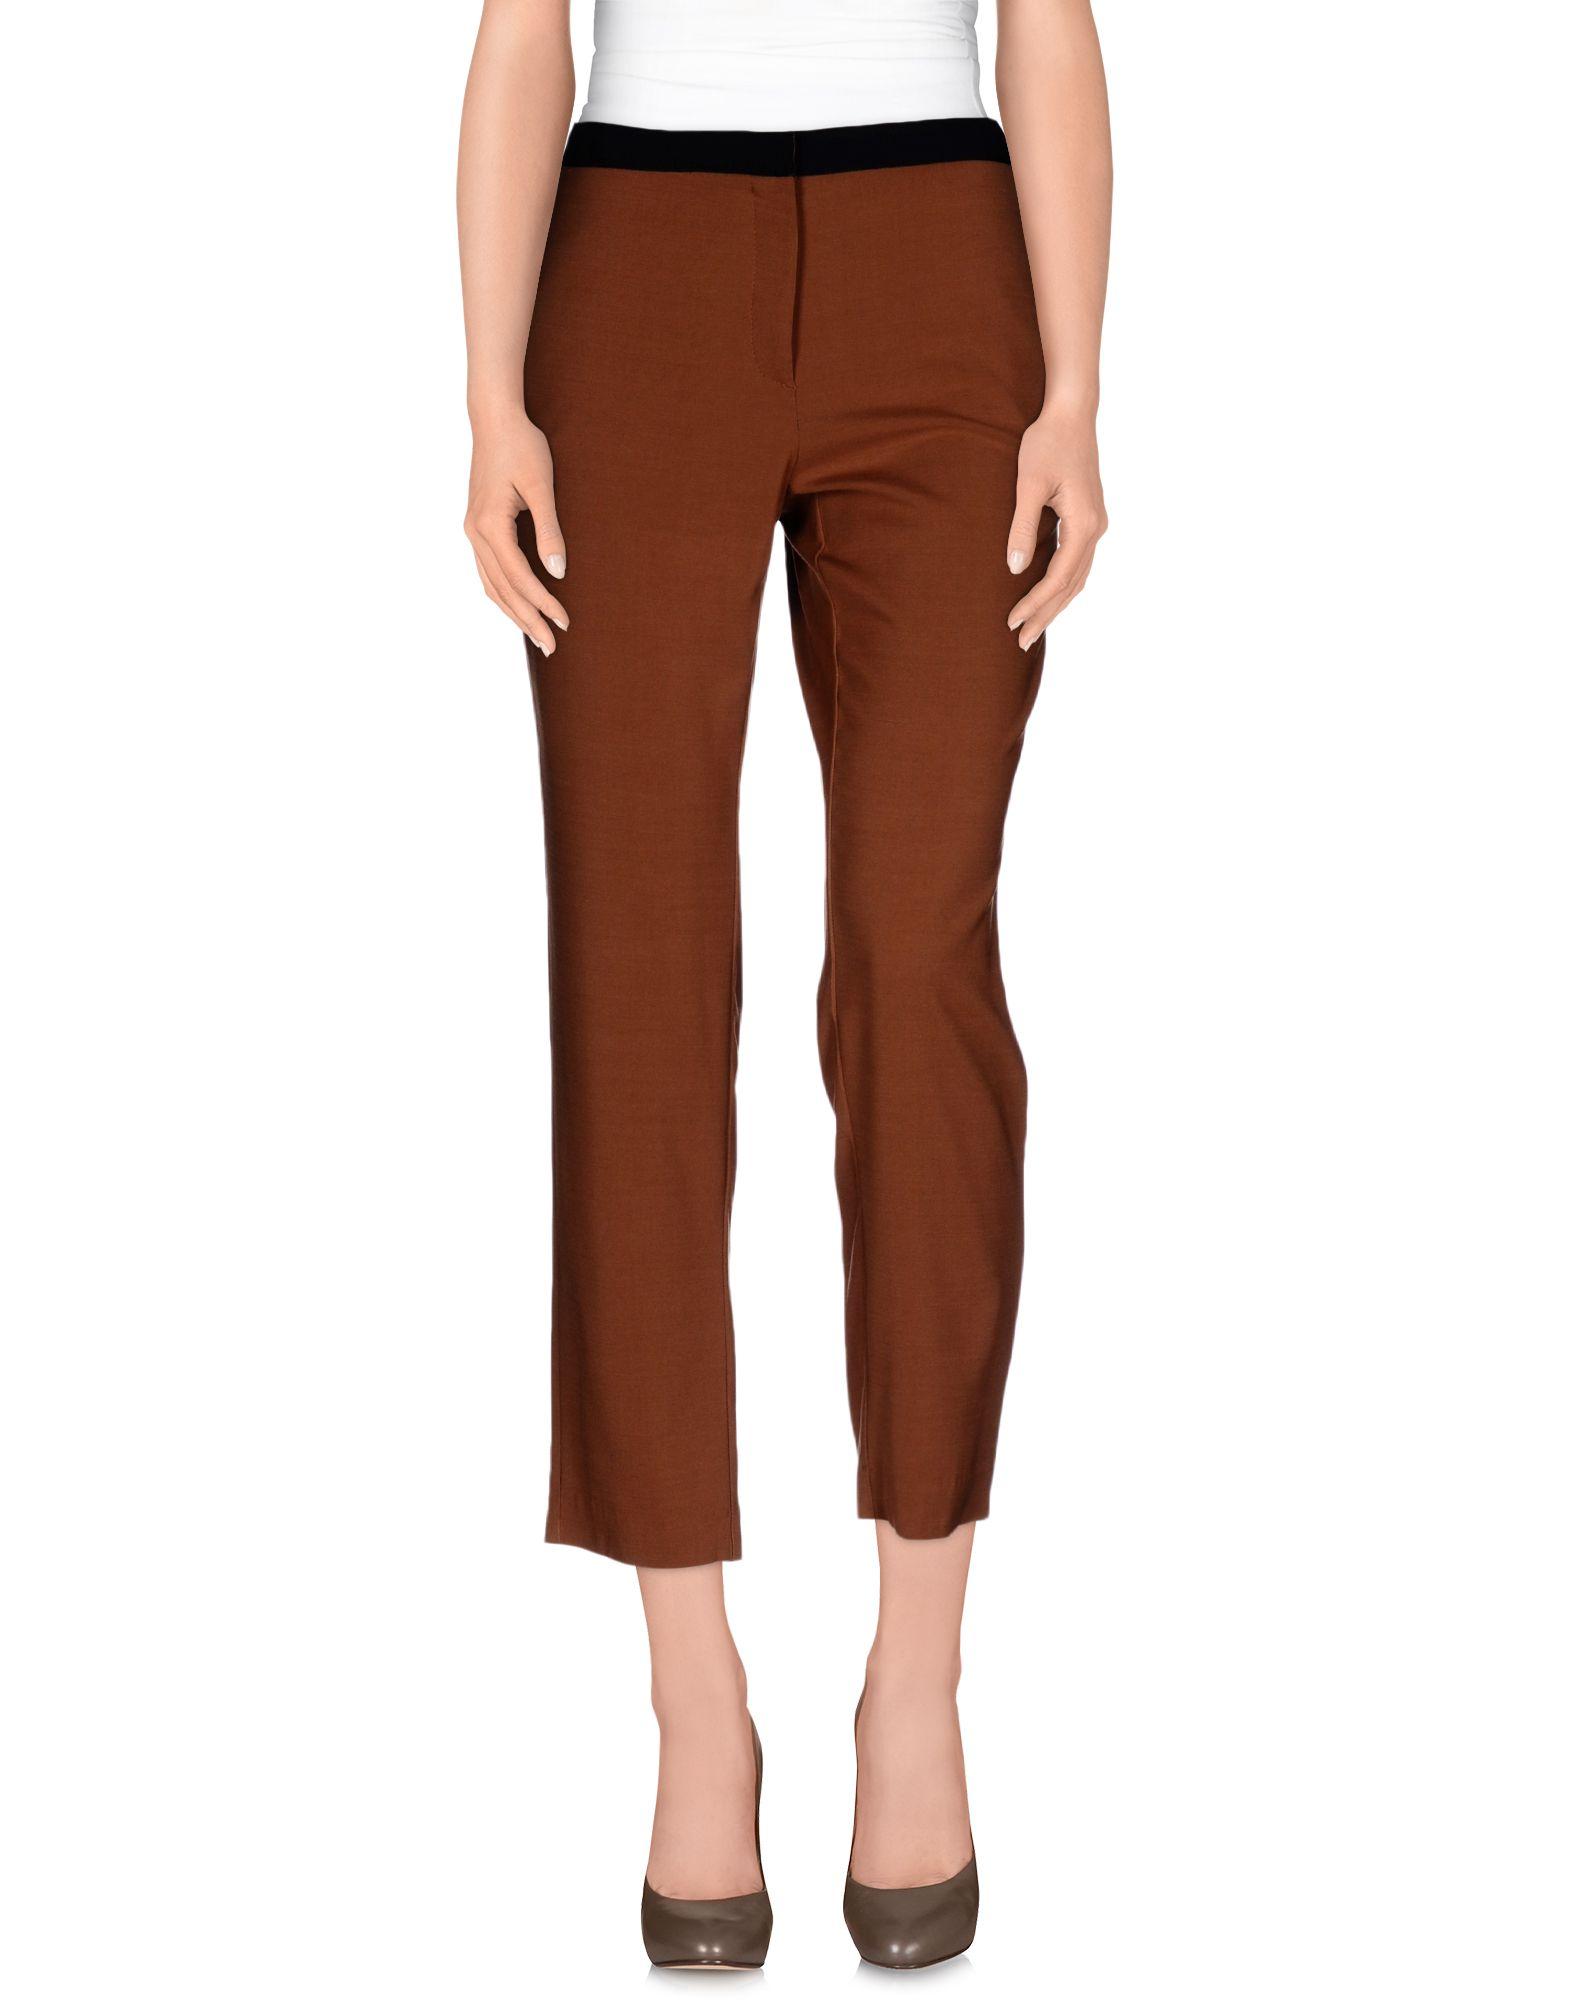 ANIYE BY Damen Hose Farbe Braun Größe 5